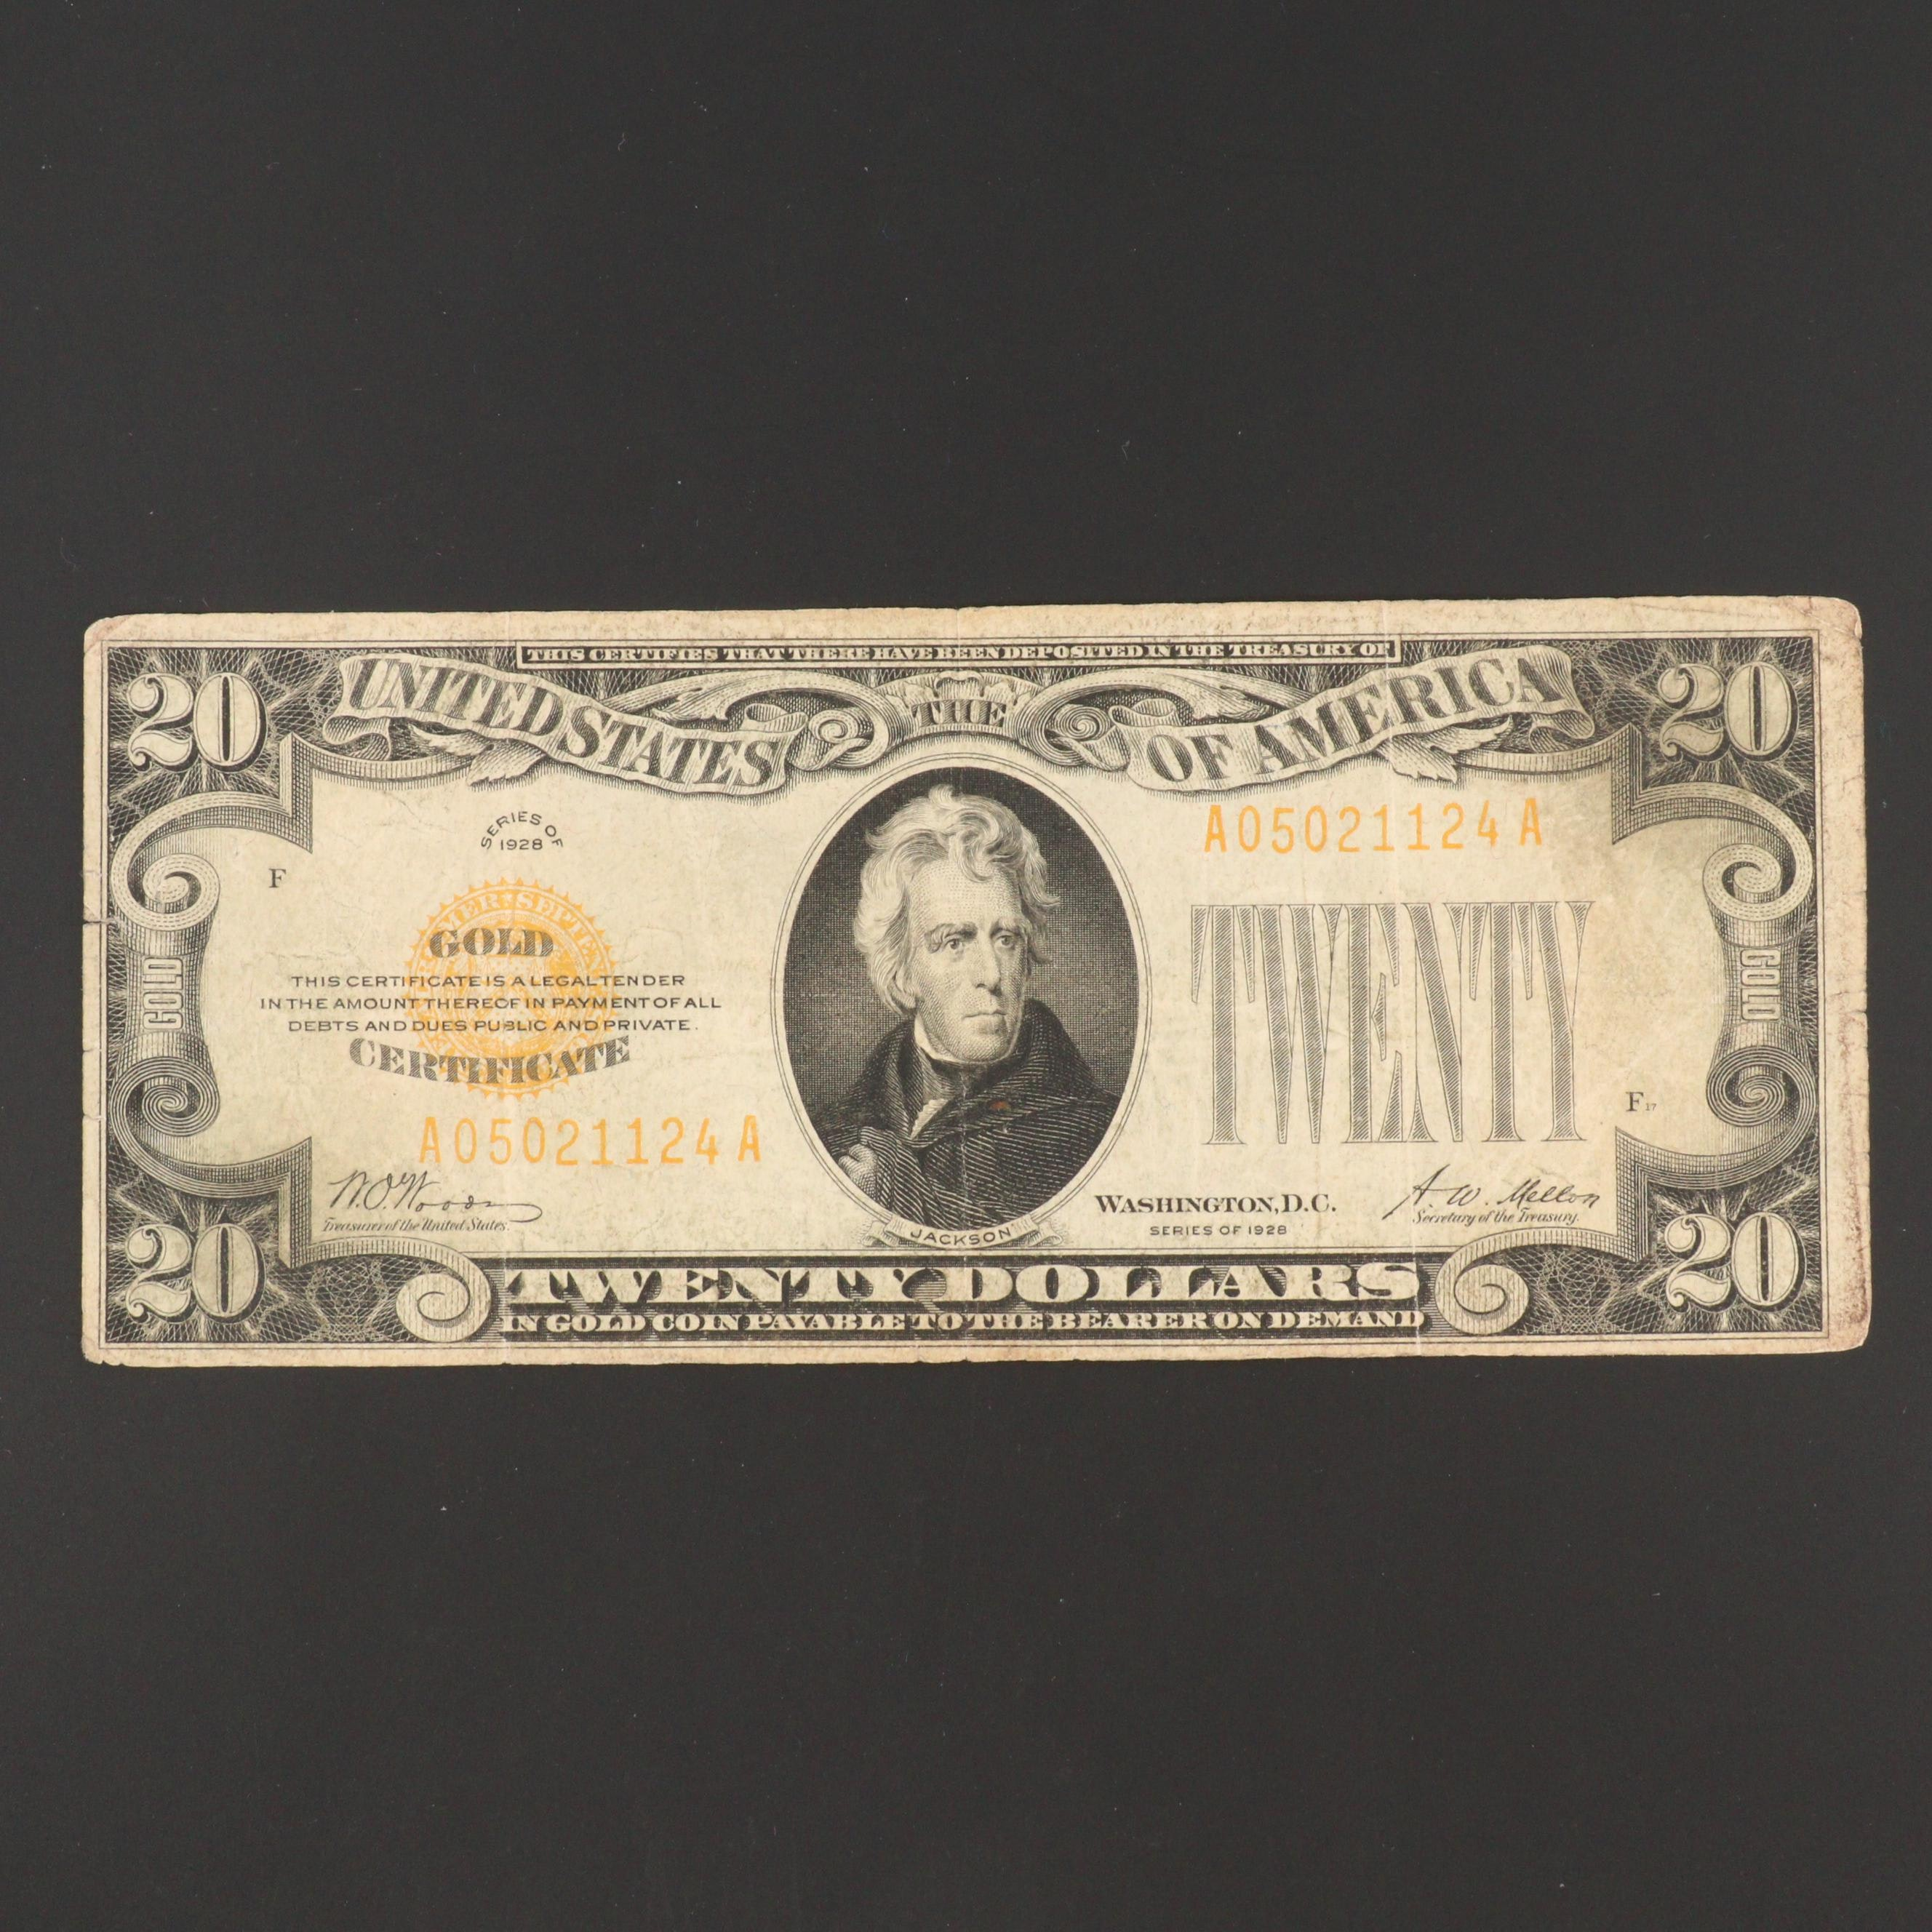 Series of 1928 Twenty Dollar Gold Certificate